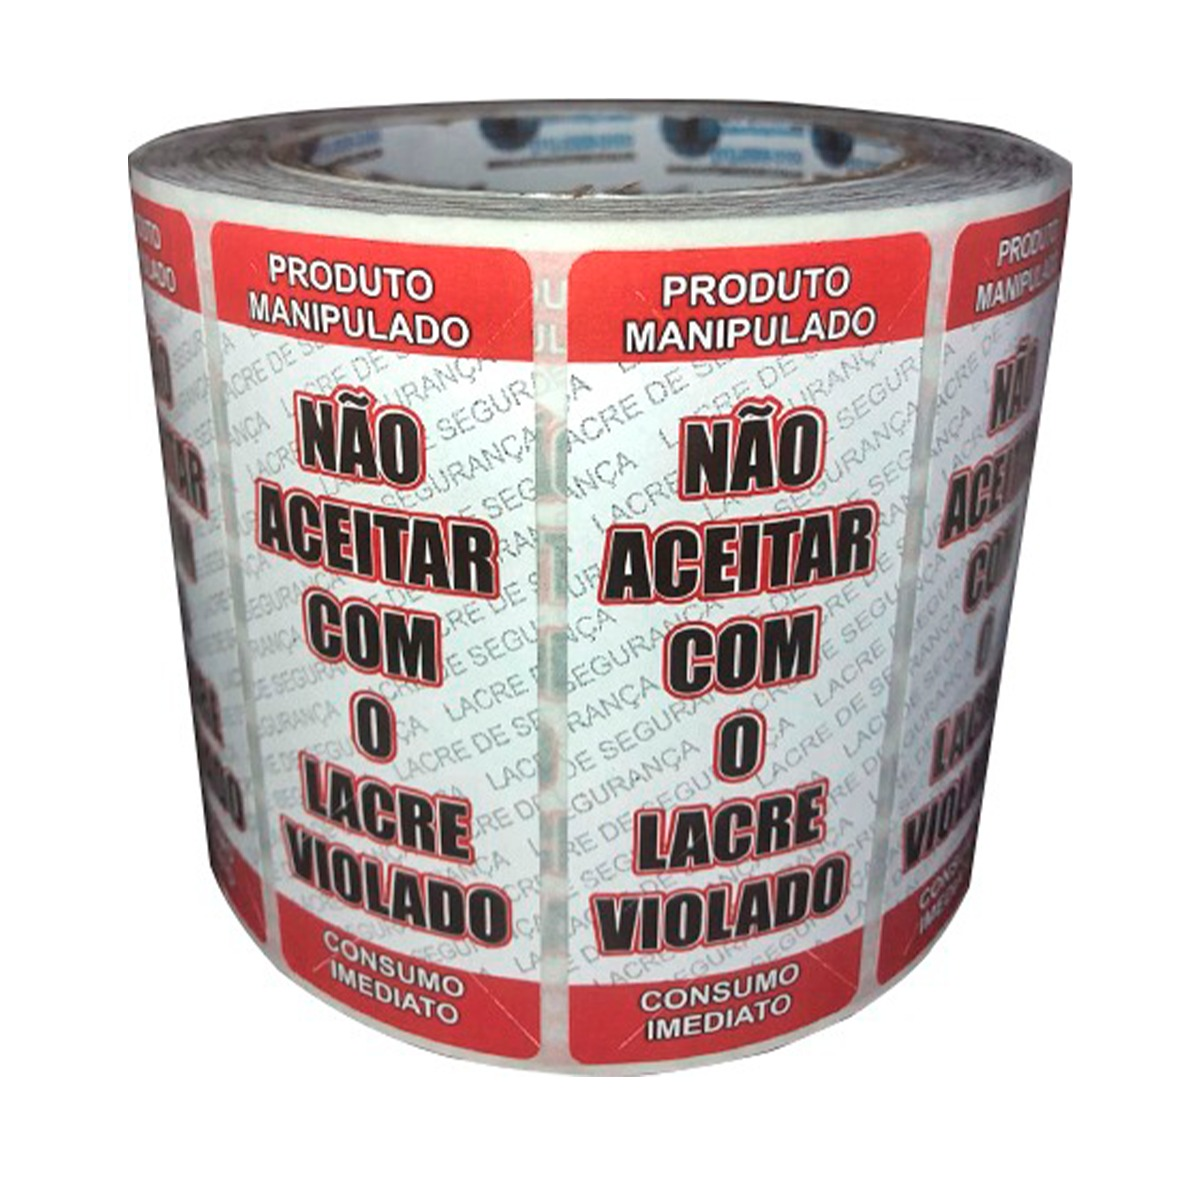 Kit 6 Rolos de Etiqueta Adesiva Lacre para Delivery 90mmX35mm Vermelho